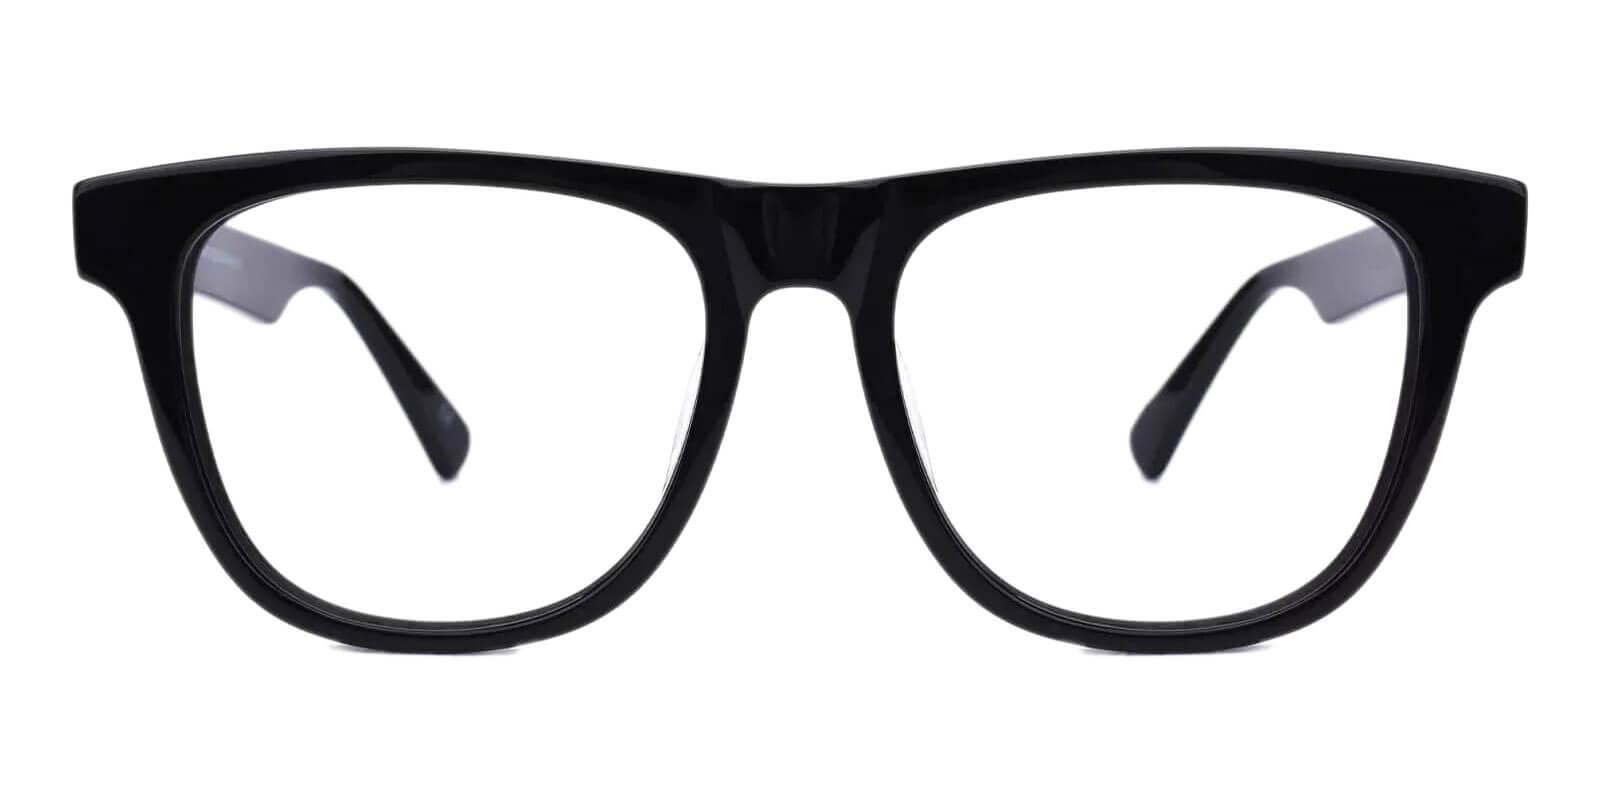 New Florence Black Acetate Eyeglasses , SpringHinges , UniversalBridgeFit Frames from ABBE Glasses